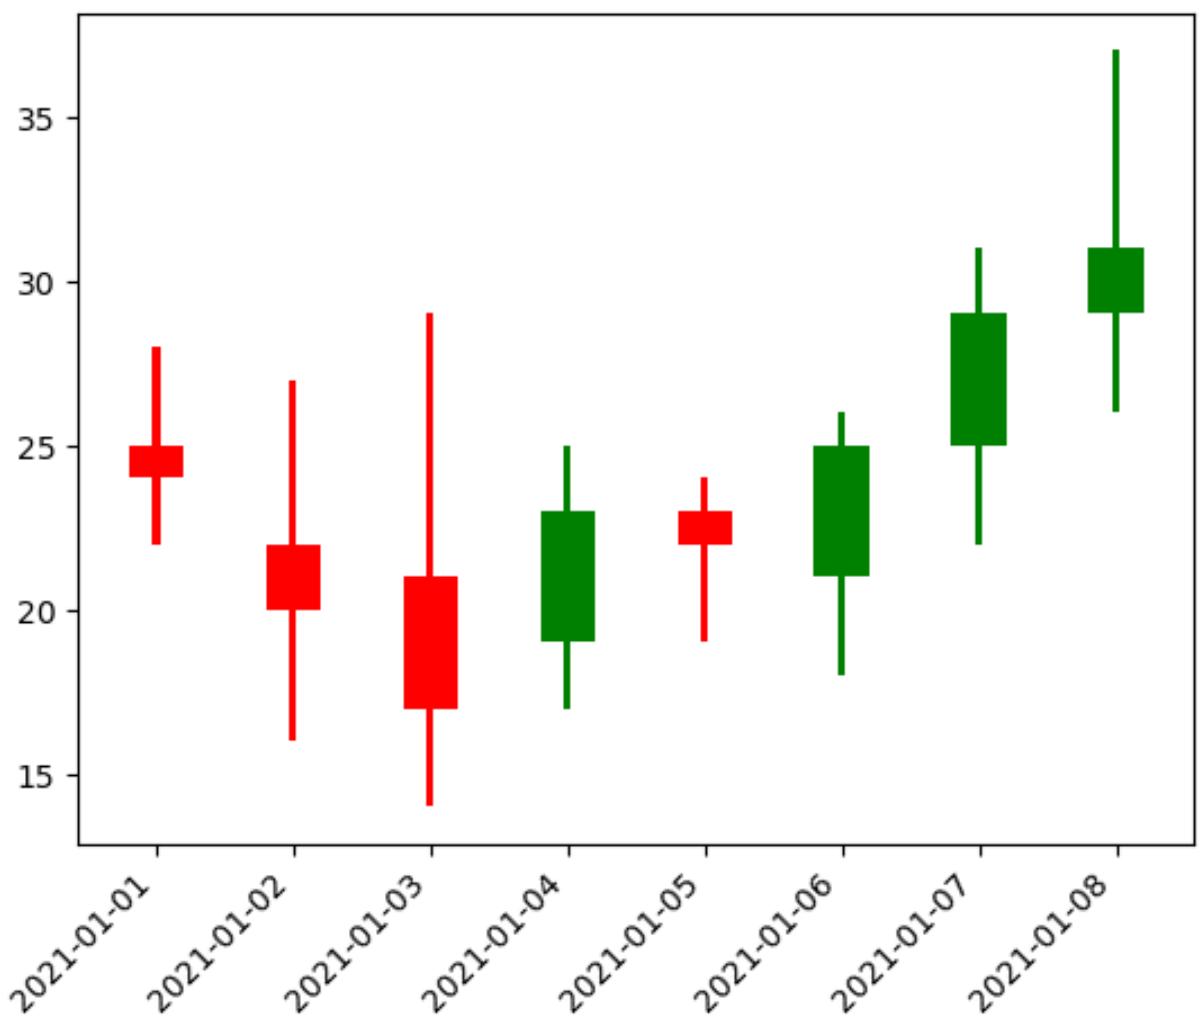 Candlestick chart using matplotlib in Python